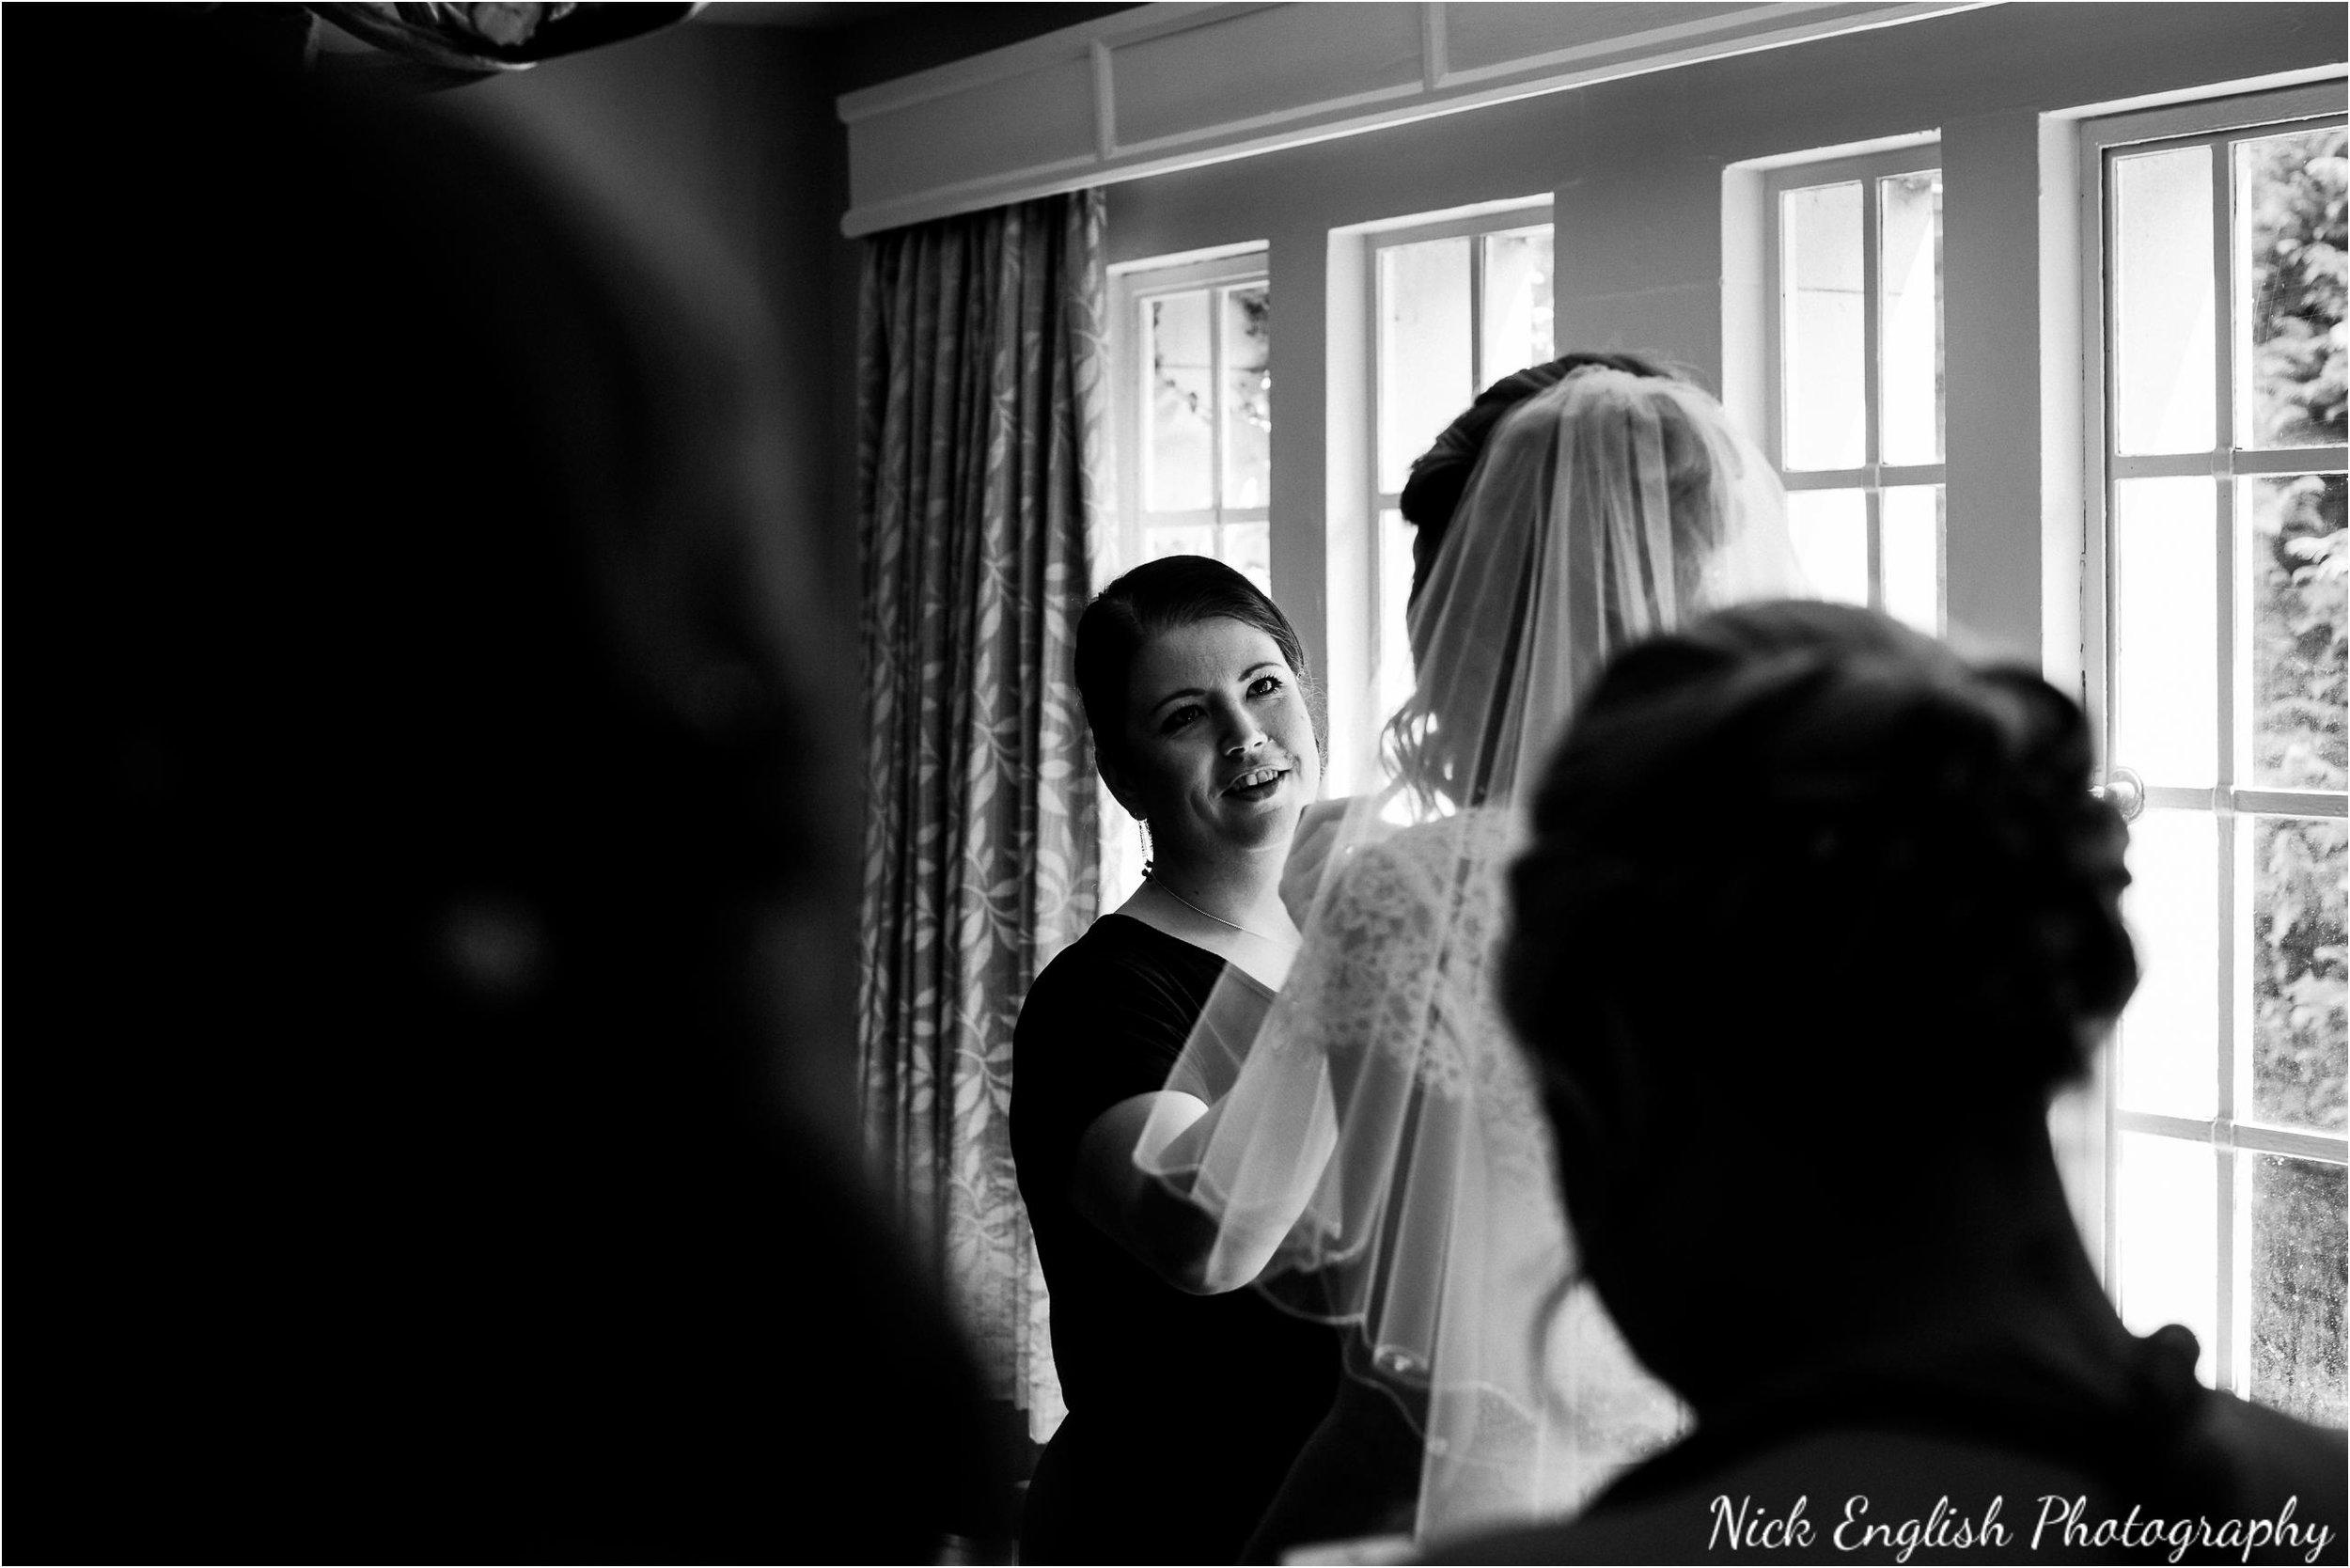 Alison James Wedding Photographs at Eaves Hall West Bradford 66jpg.jpeg